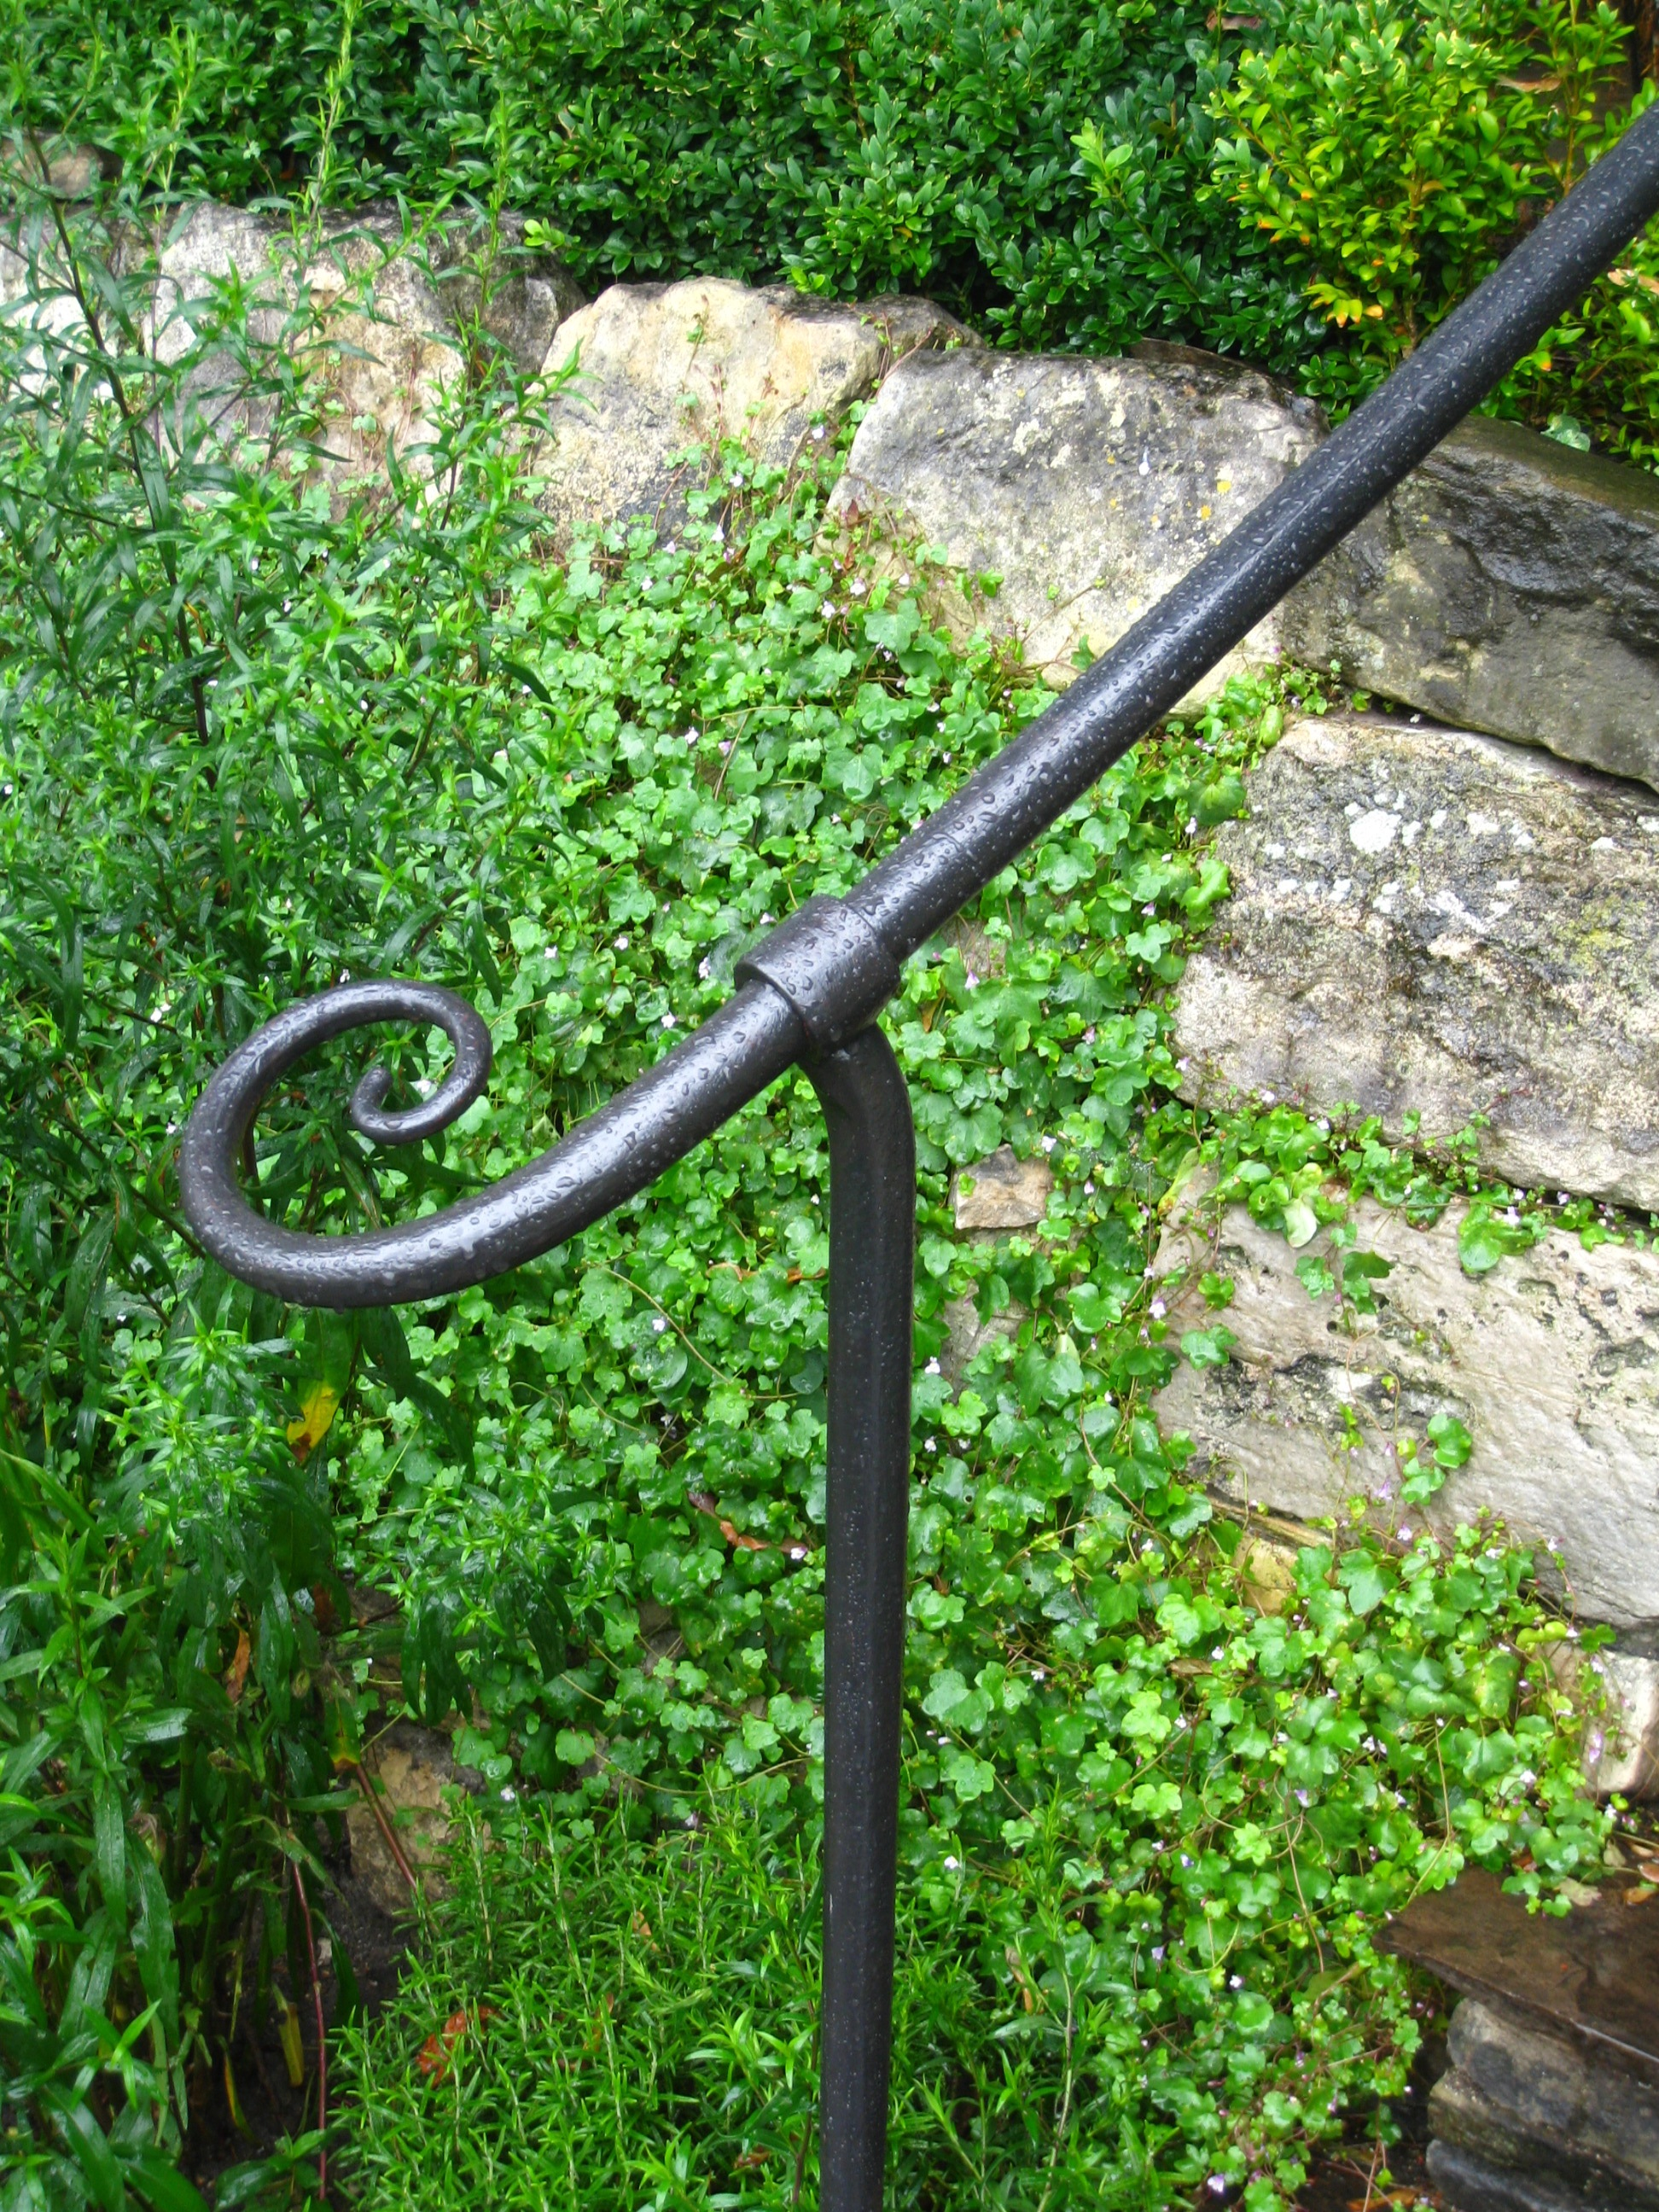 W-I-handrail